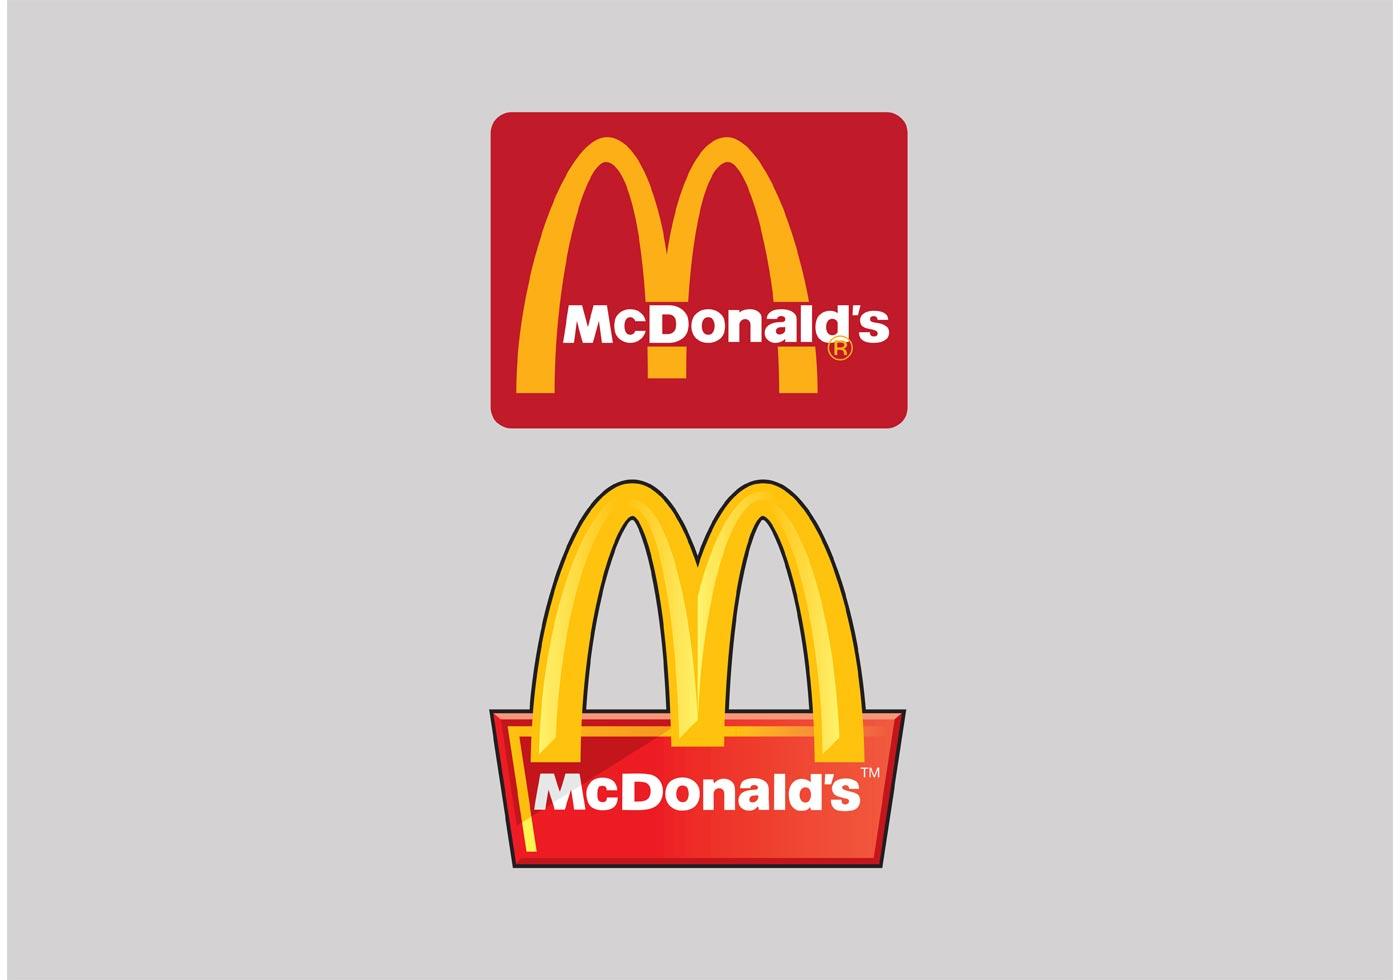 McDonalds - Kostenlose Vektor-Kunst, Archiv-Grafiken & Bilder ...